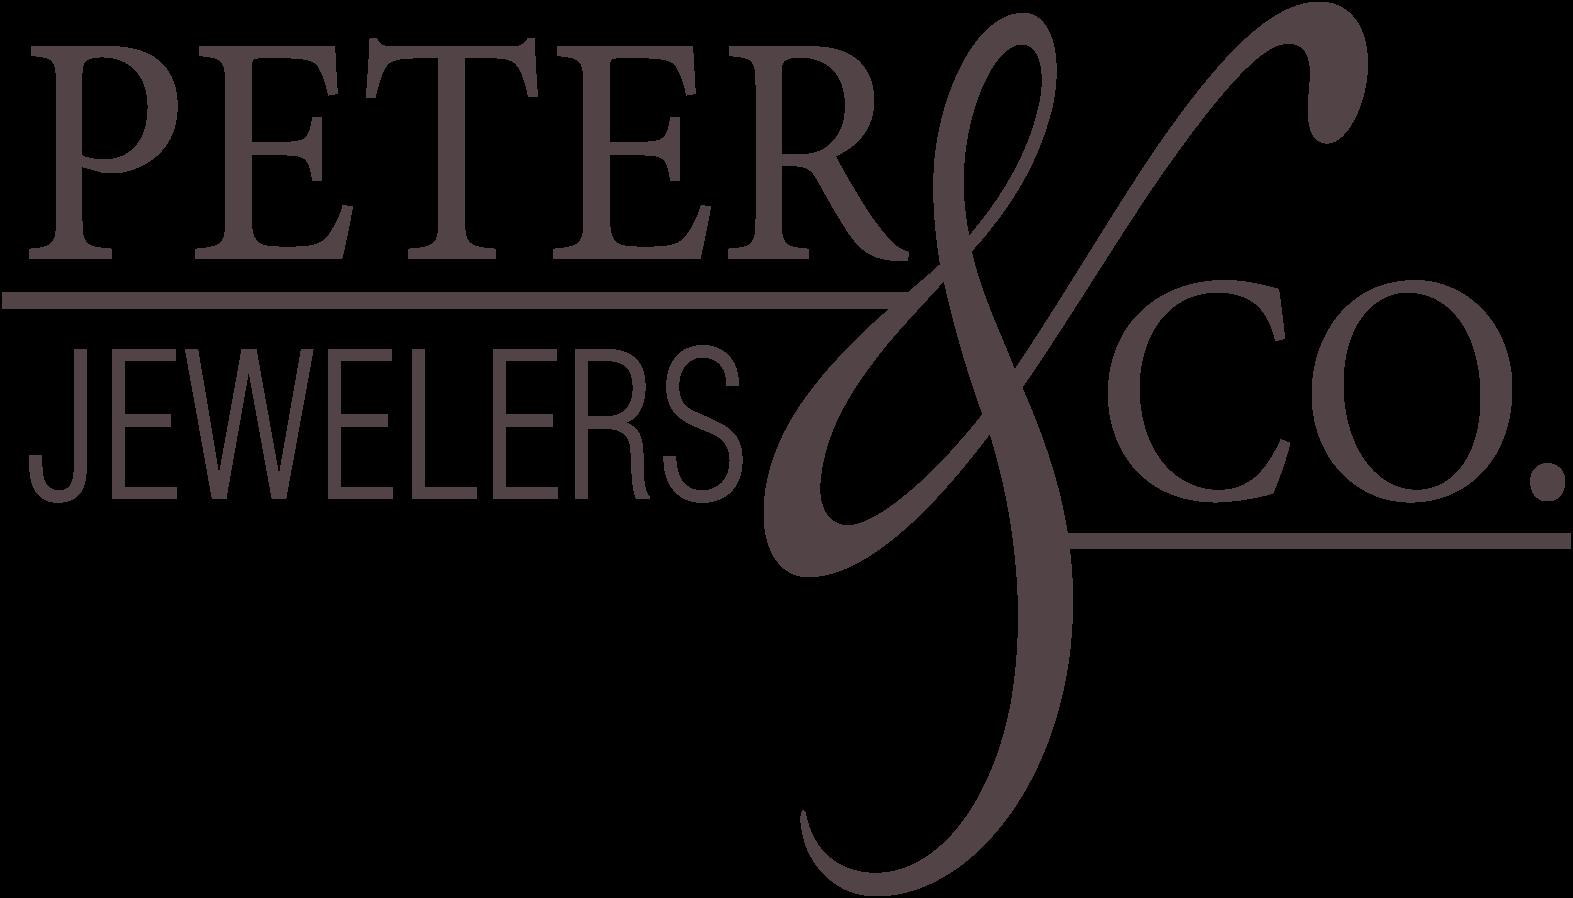 Peter Jewlers